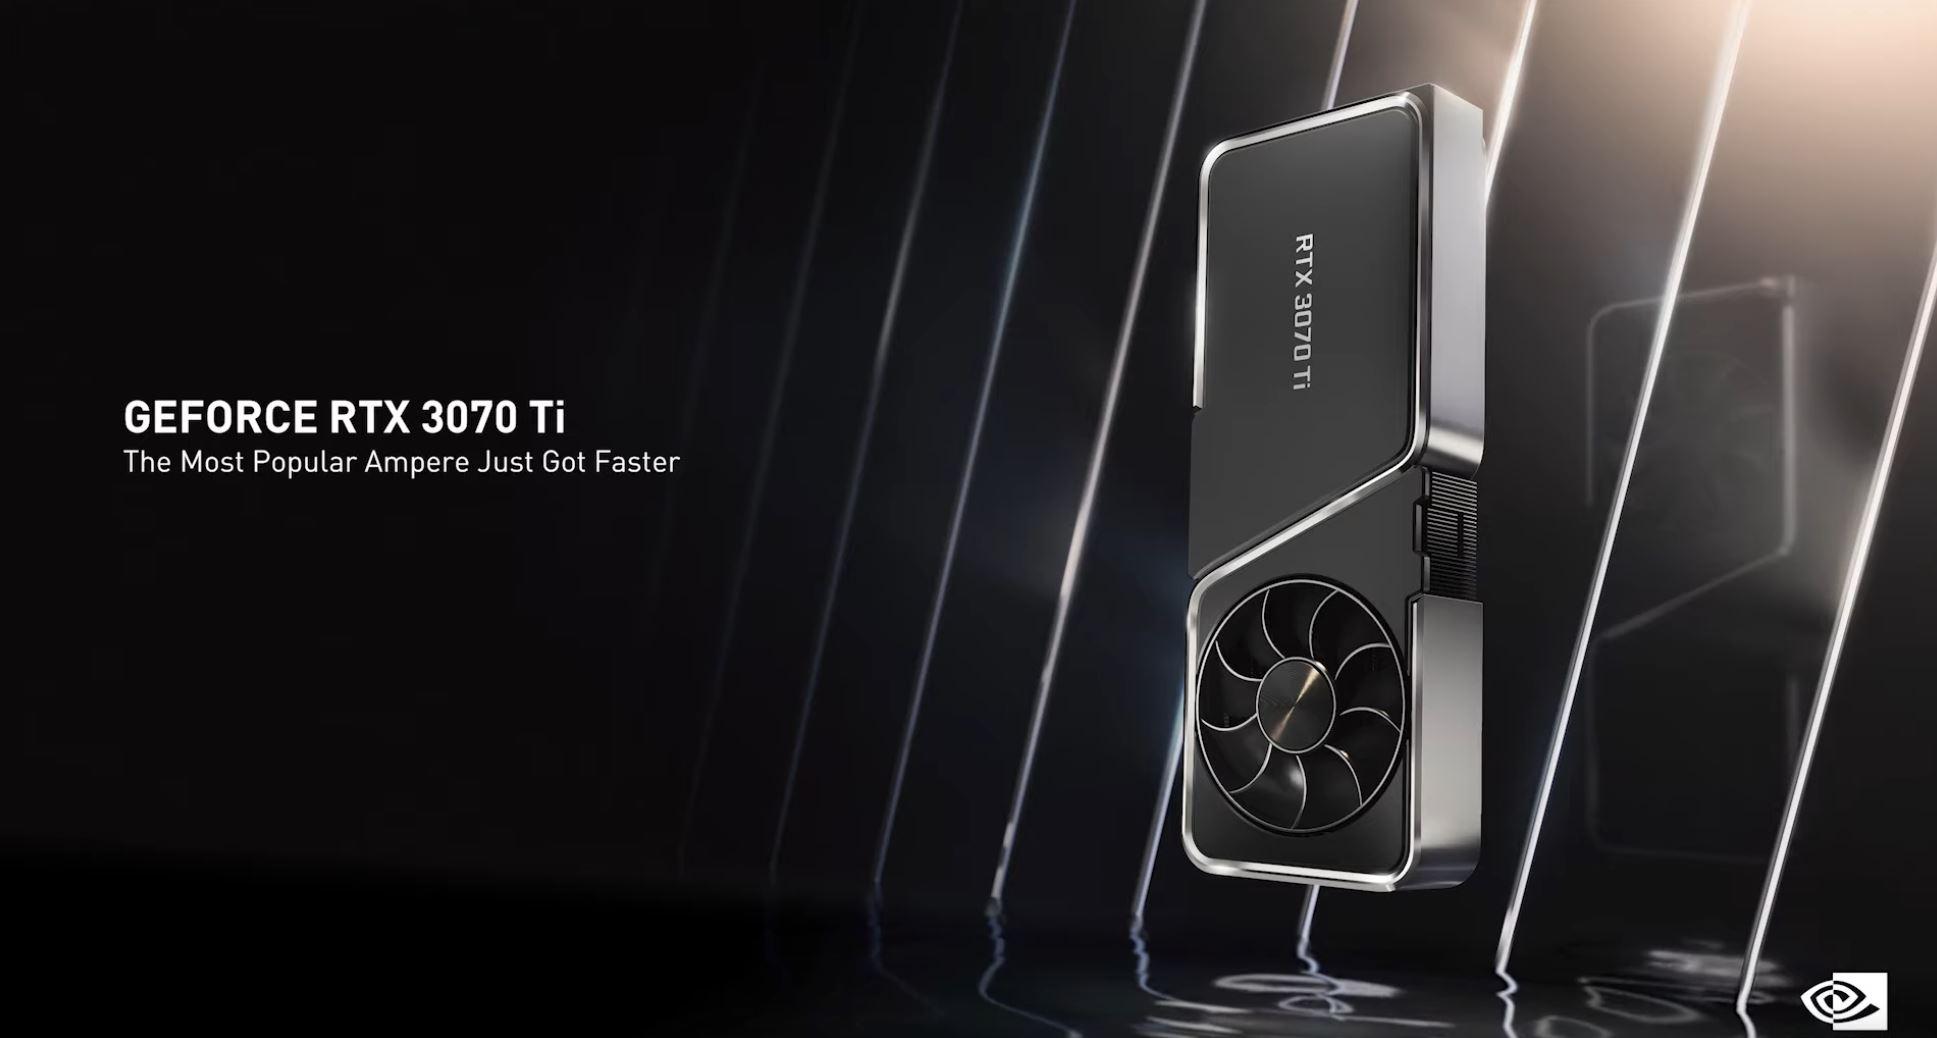 Nvidia GeForce RTX 3080 Ti, RTX 3070 Ti Presentation via Nvidia on YT 4